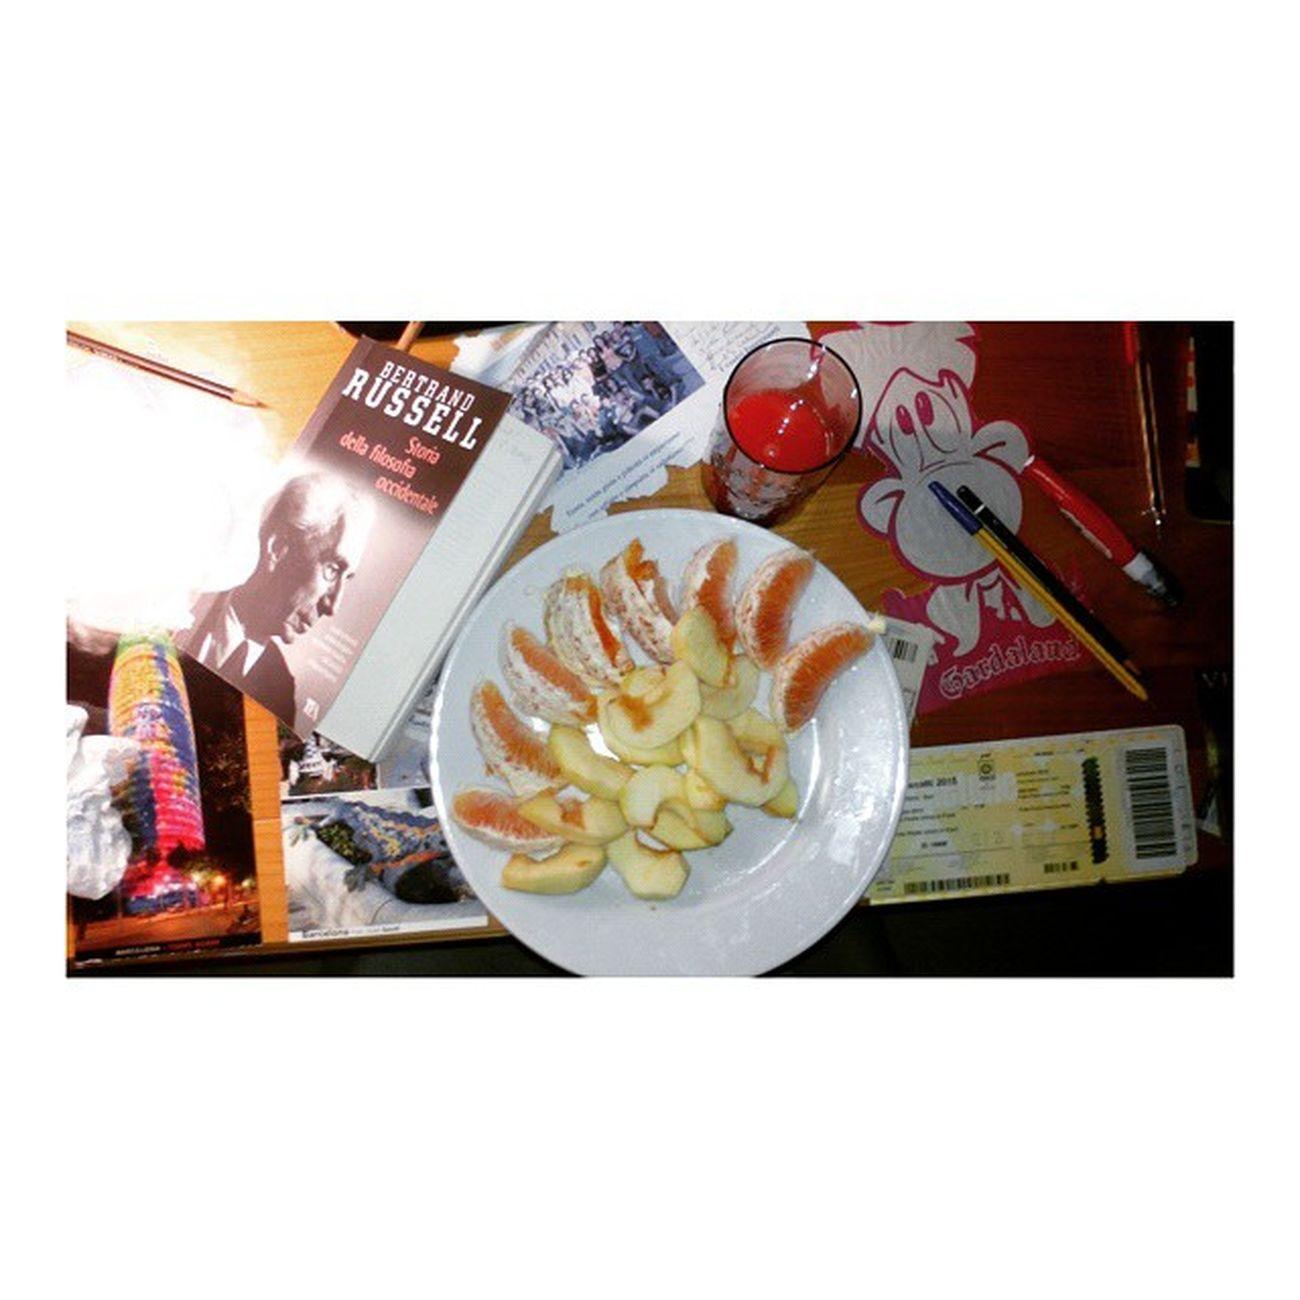 Buona filosofia a me!👊✌ Sistudia Platone Lafame Mangiosano Nonvidico Orangejuice Orange Apple Stoapposto Instagoodfood Instafruit Instalove Instafilosofia Likeforme Likeforlike Likeforfollw Followforfollow